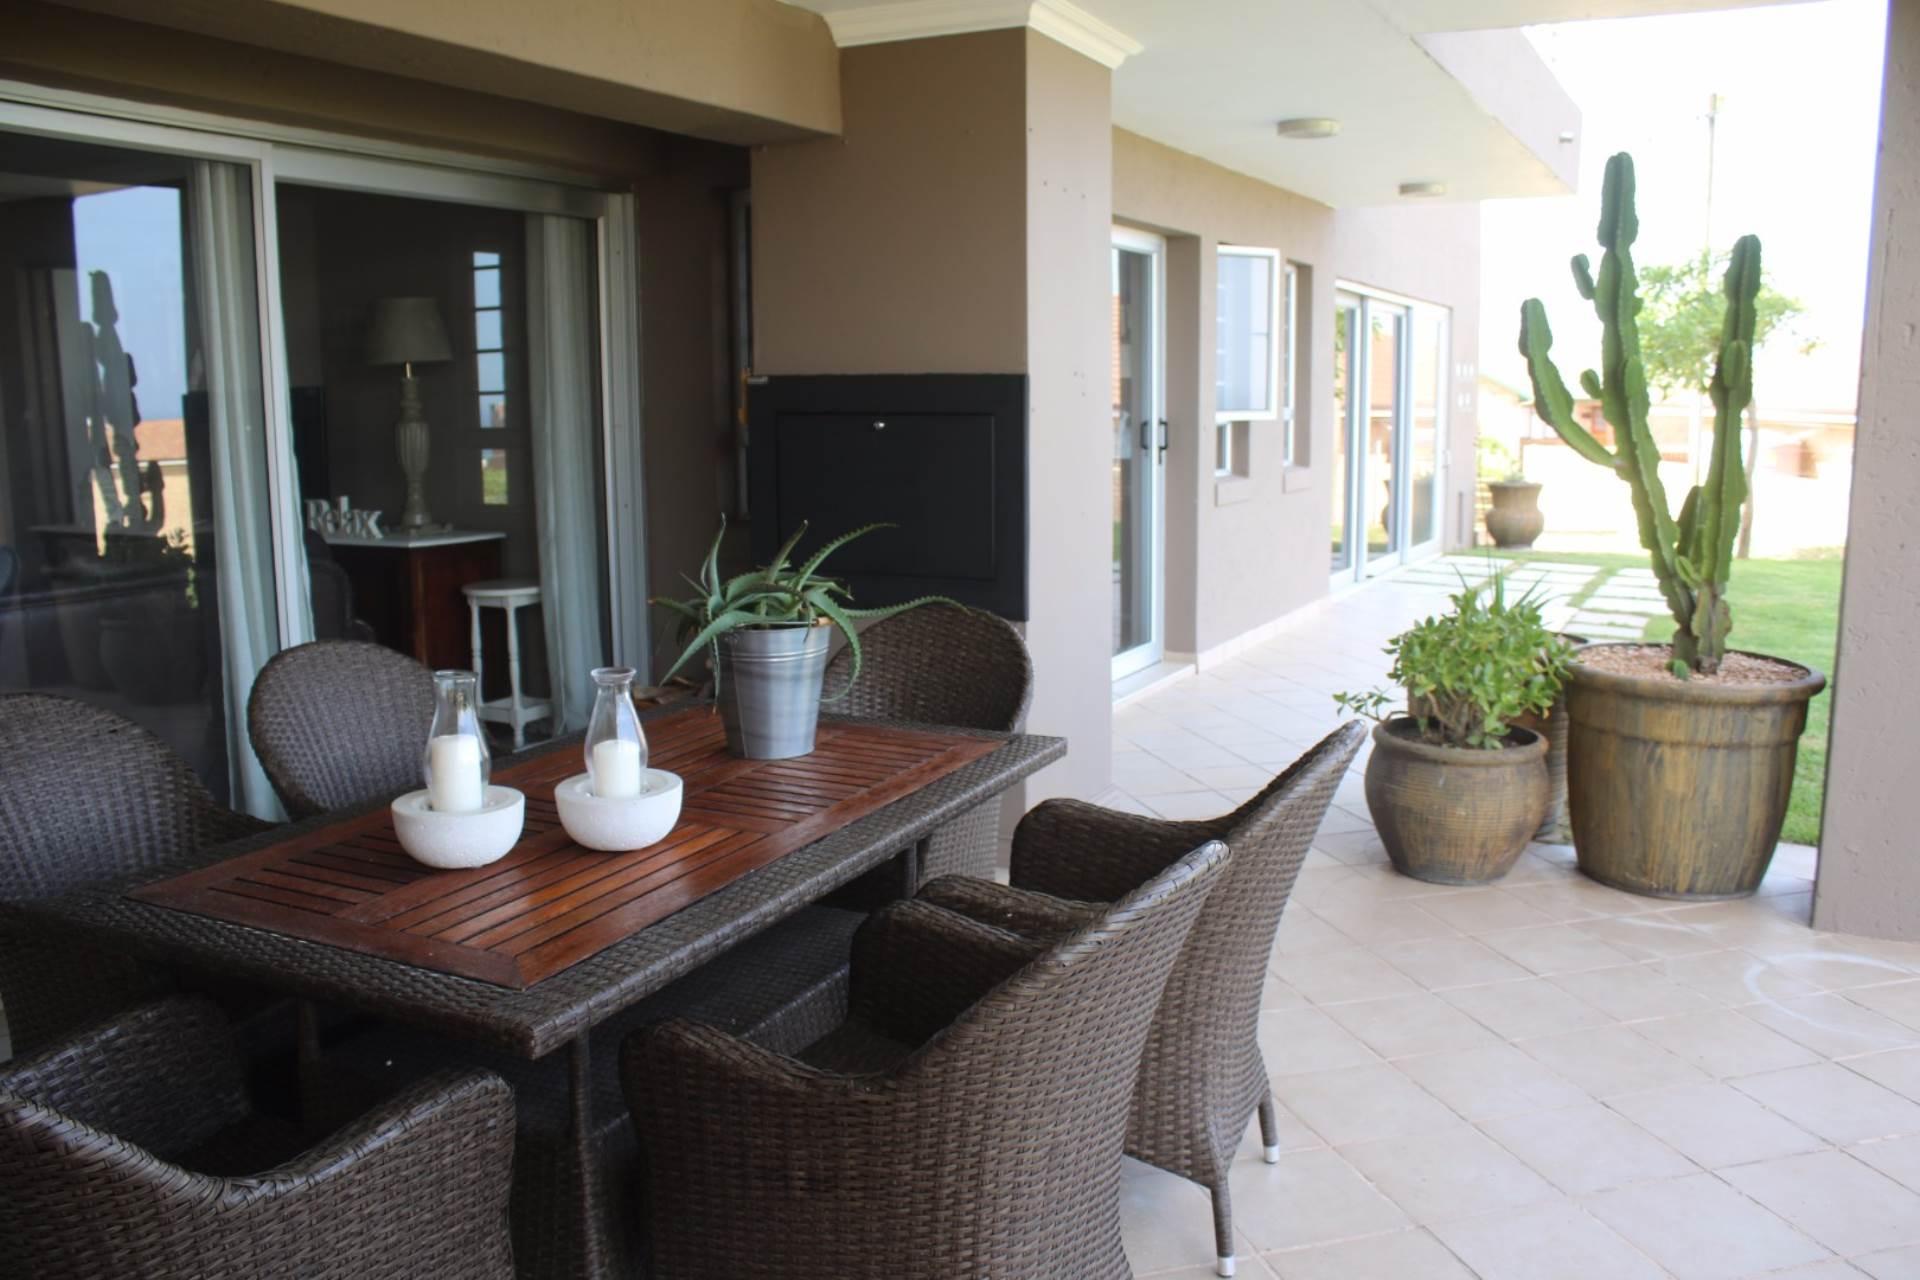 5 BedroomHouse For Sale In Boggomsbaai